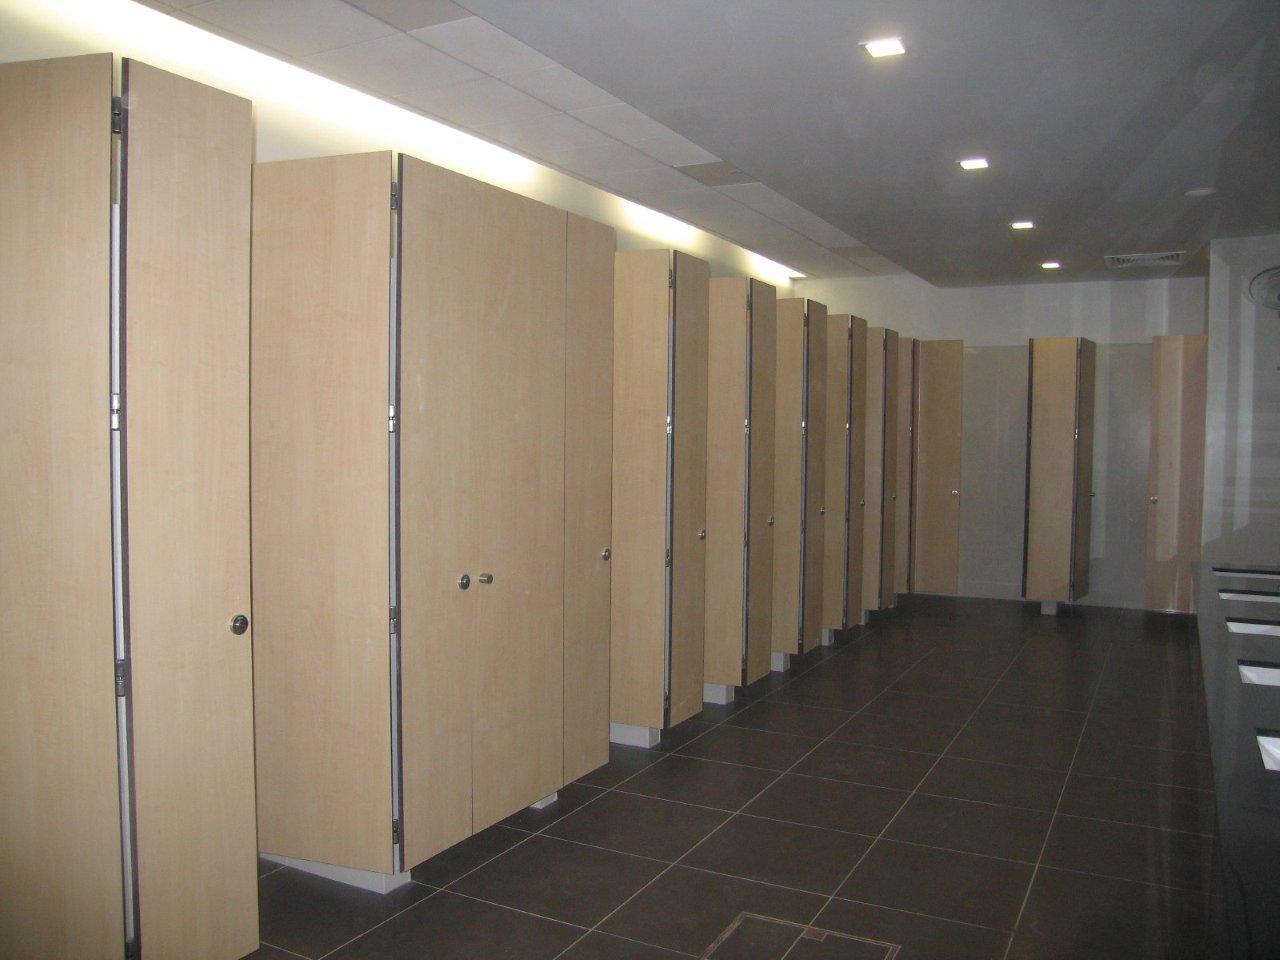 Mag High Pressure Laminate Phenolic Resin Board Toilet Cubicles ...